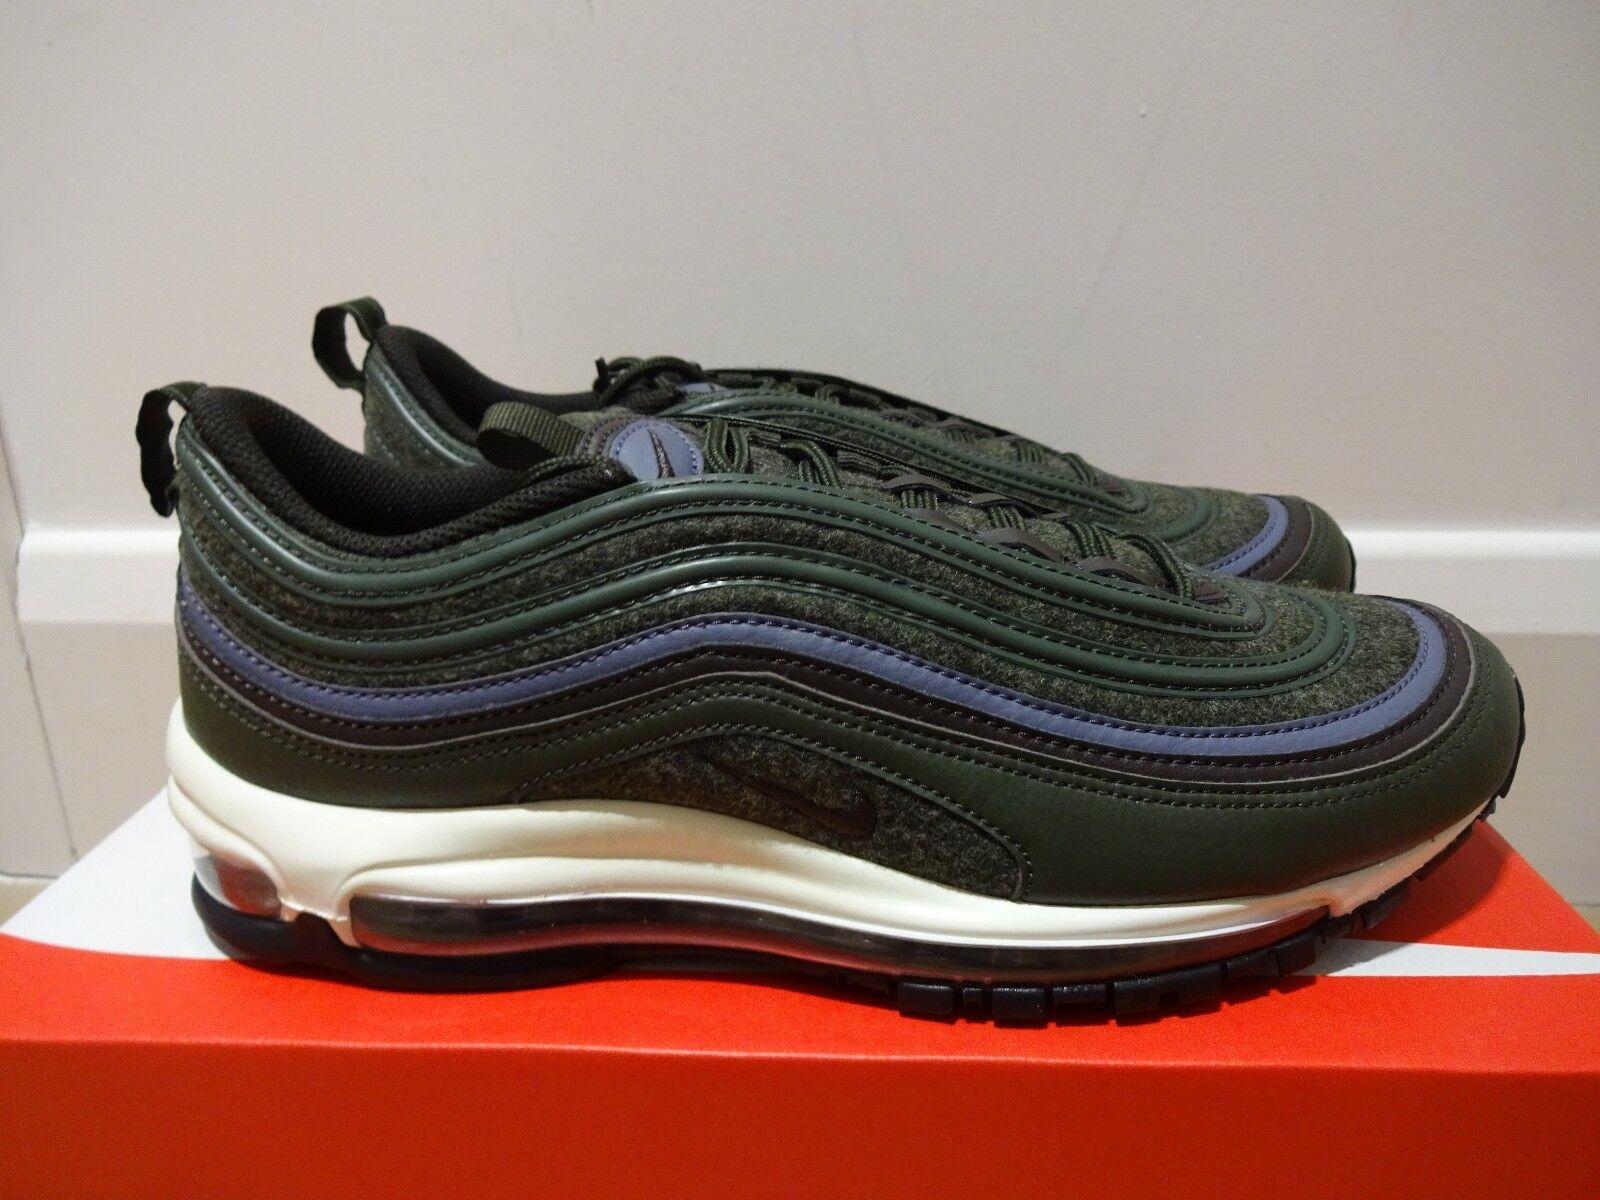 Nike air max 97 97 max premium - sequoia - braune  bnib  uk größe 7,5 312834 300 f09496